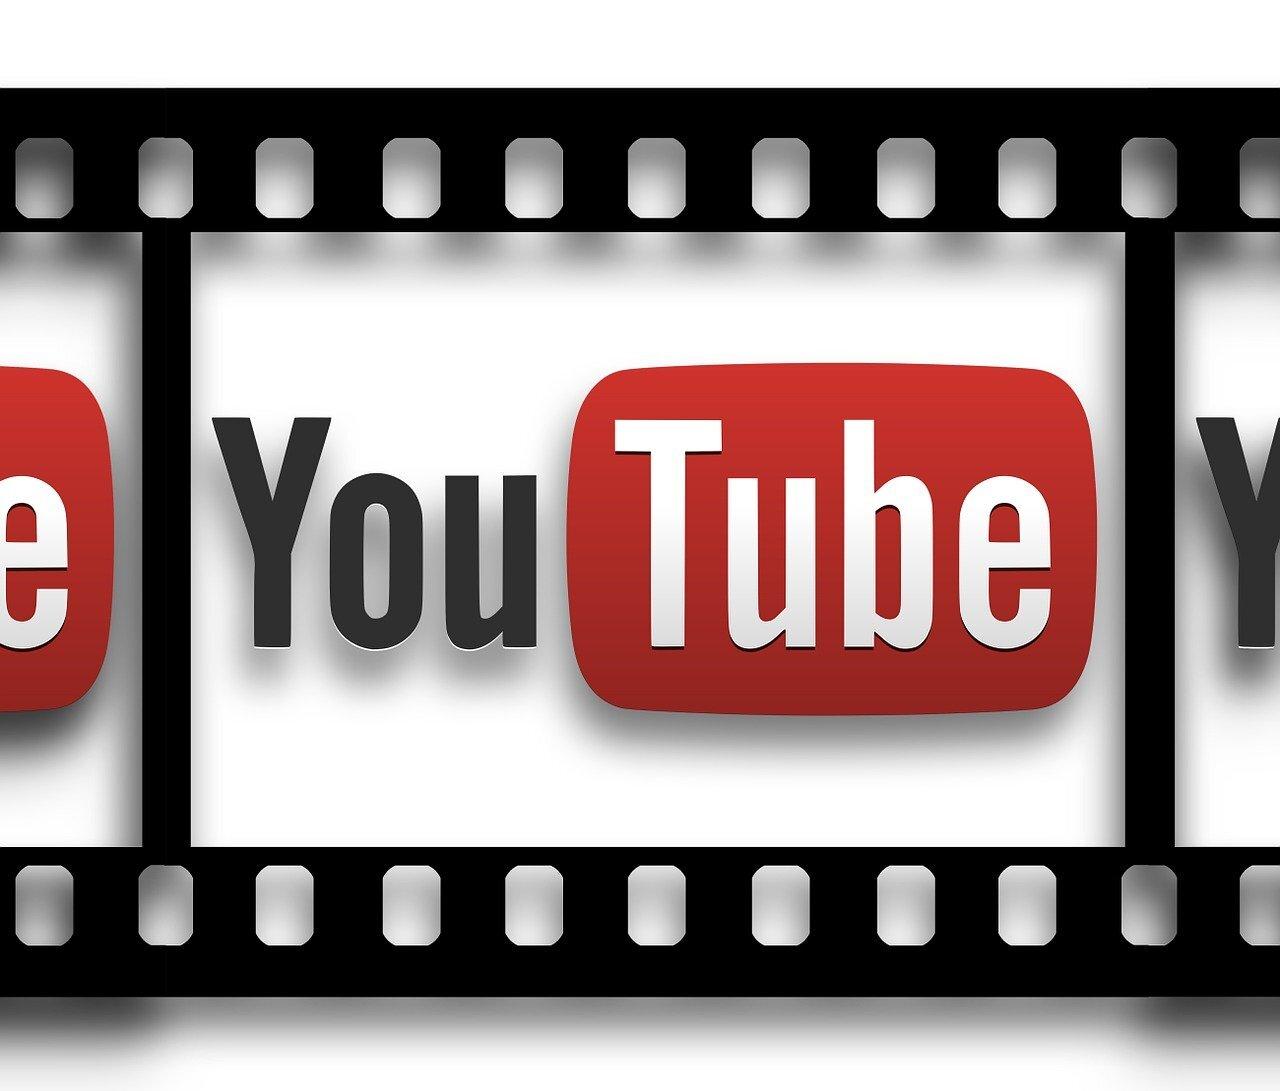 YouTube_MCN(マルチチャンネルネットワーク)_アフィリエイトチャンネル_加入規約